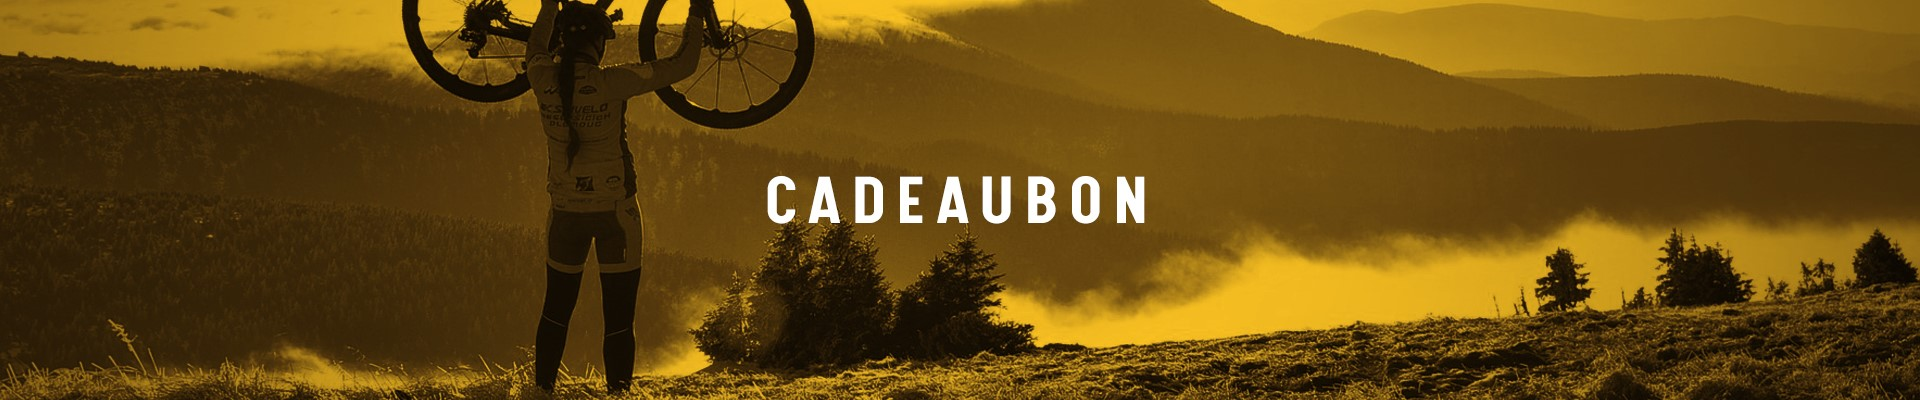 Cadeaubon bikefit of trainingsbegeleiding wolf performance